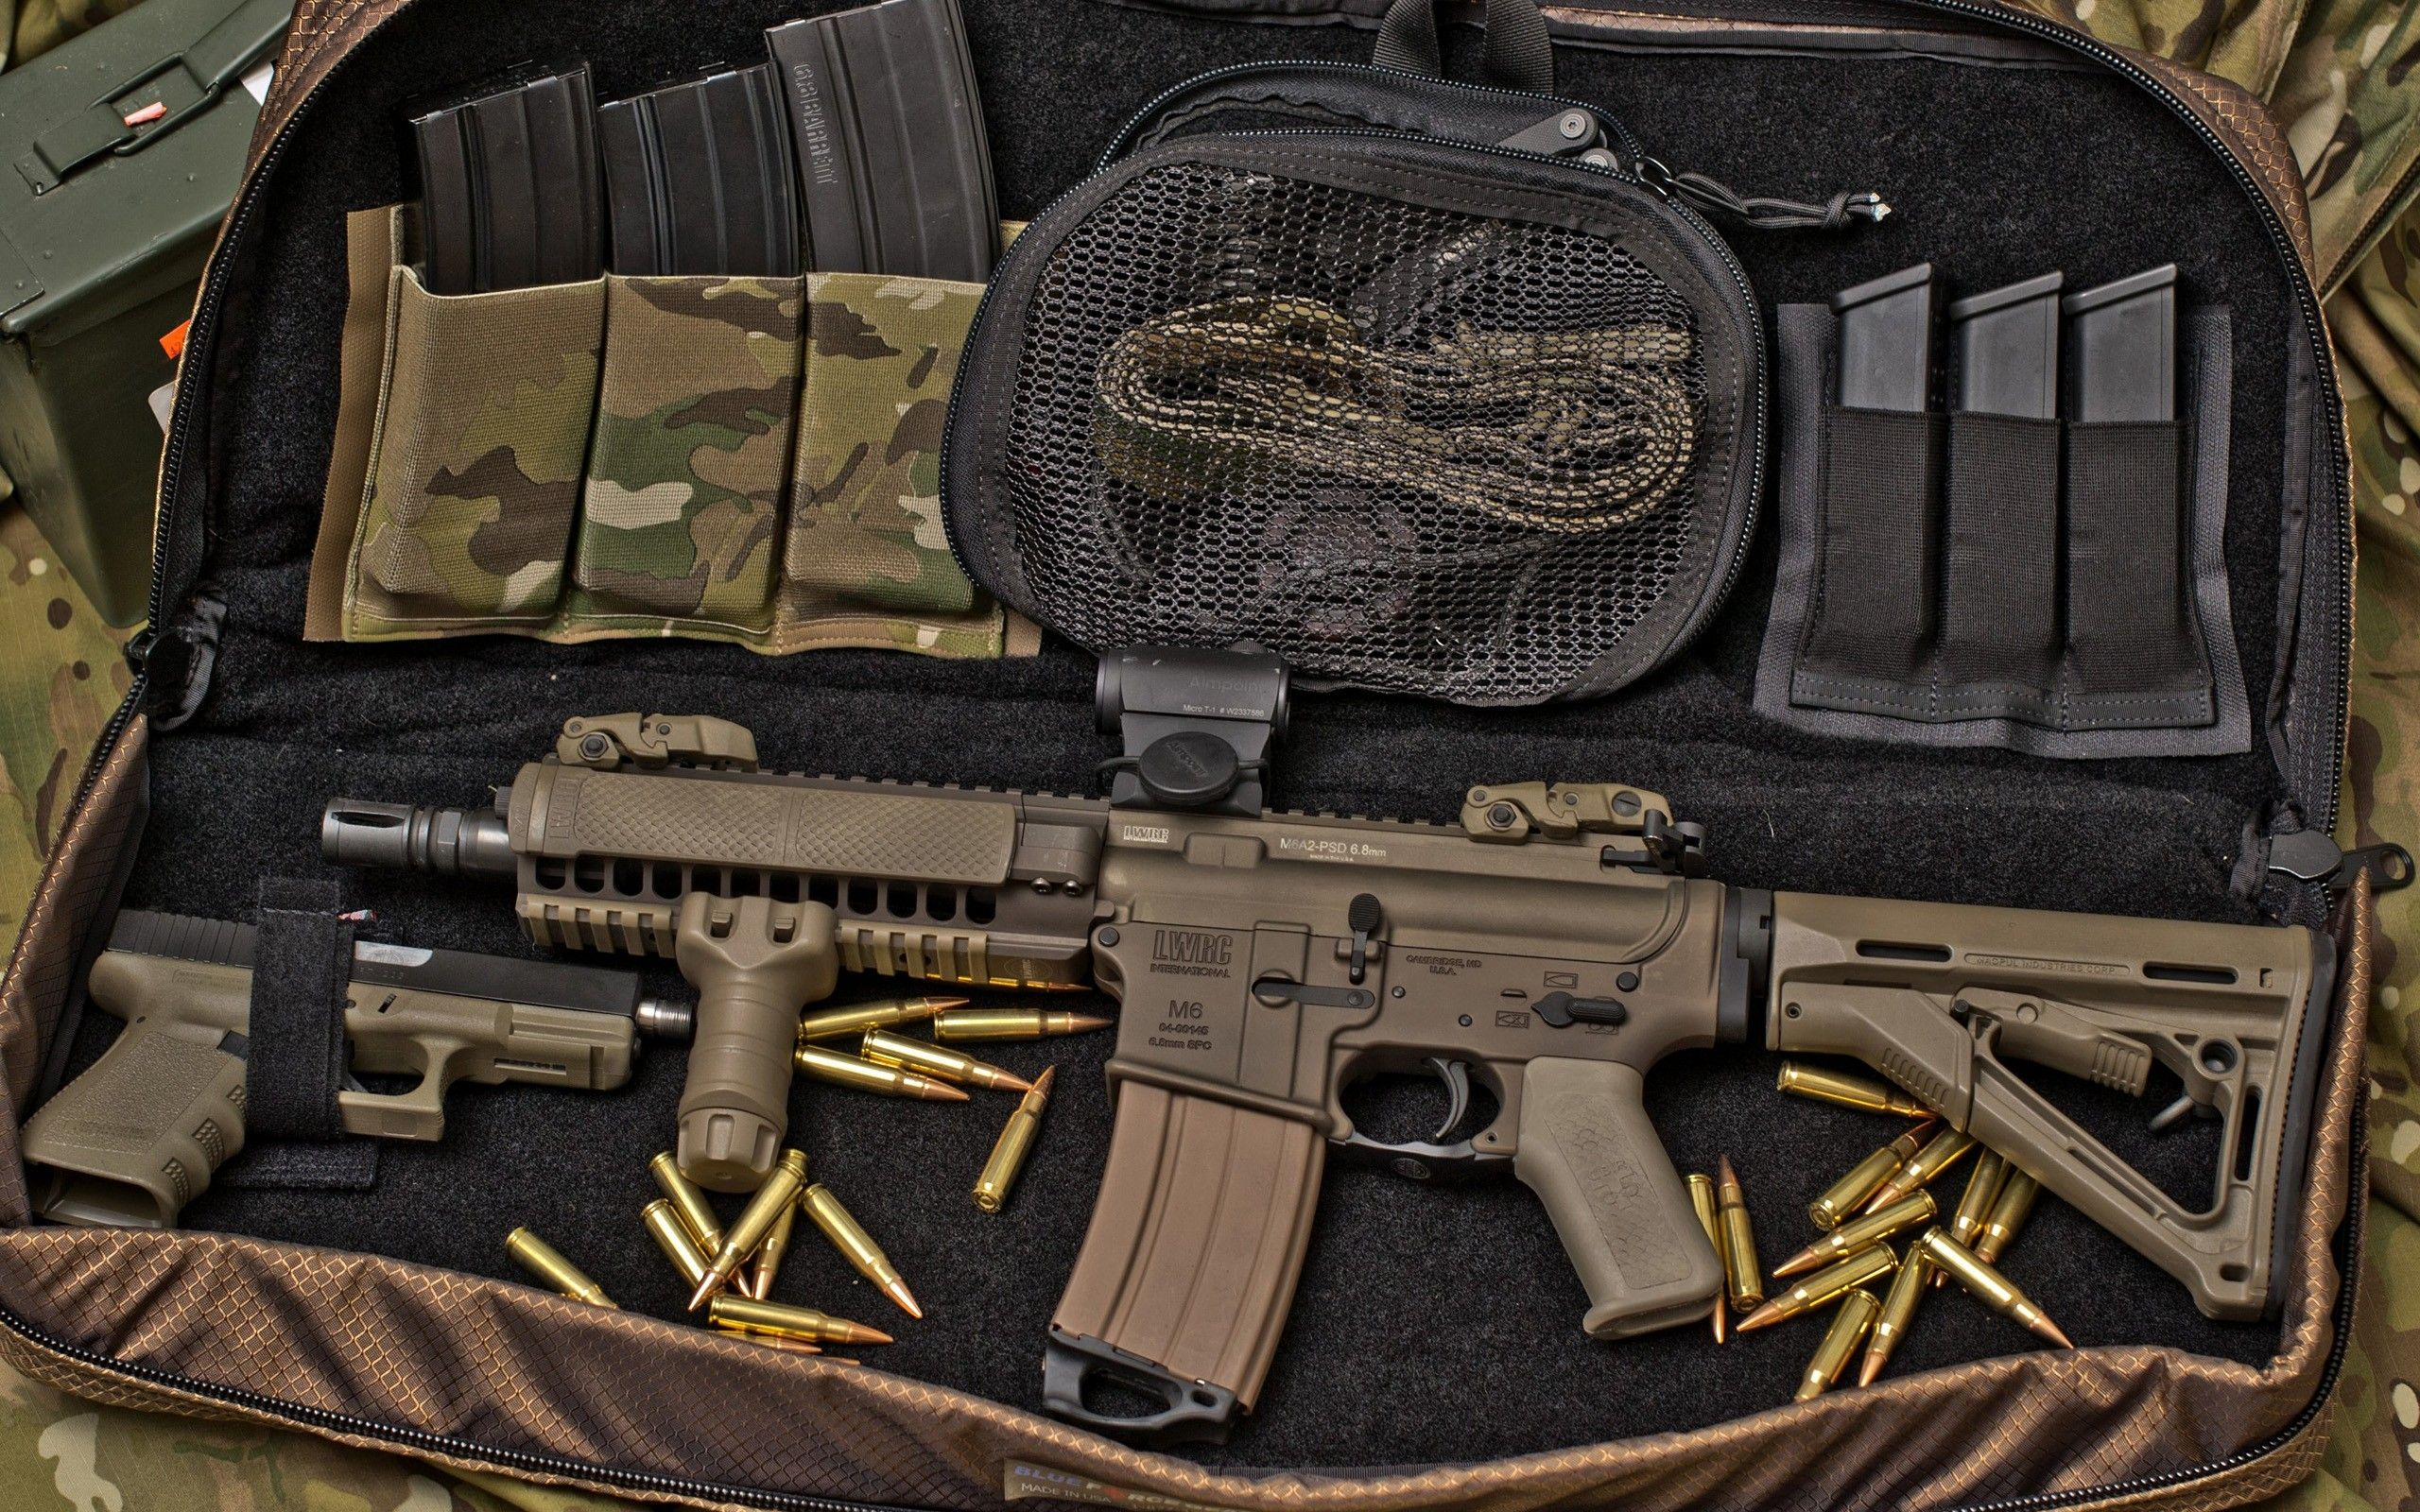 guns weapons glock magpul ar 15 m4 tactical lwrc m6 aimpoint stanag